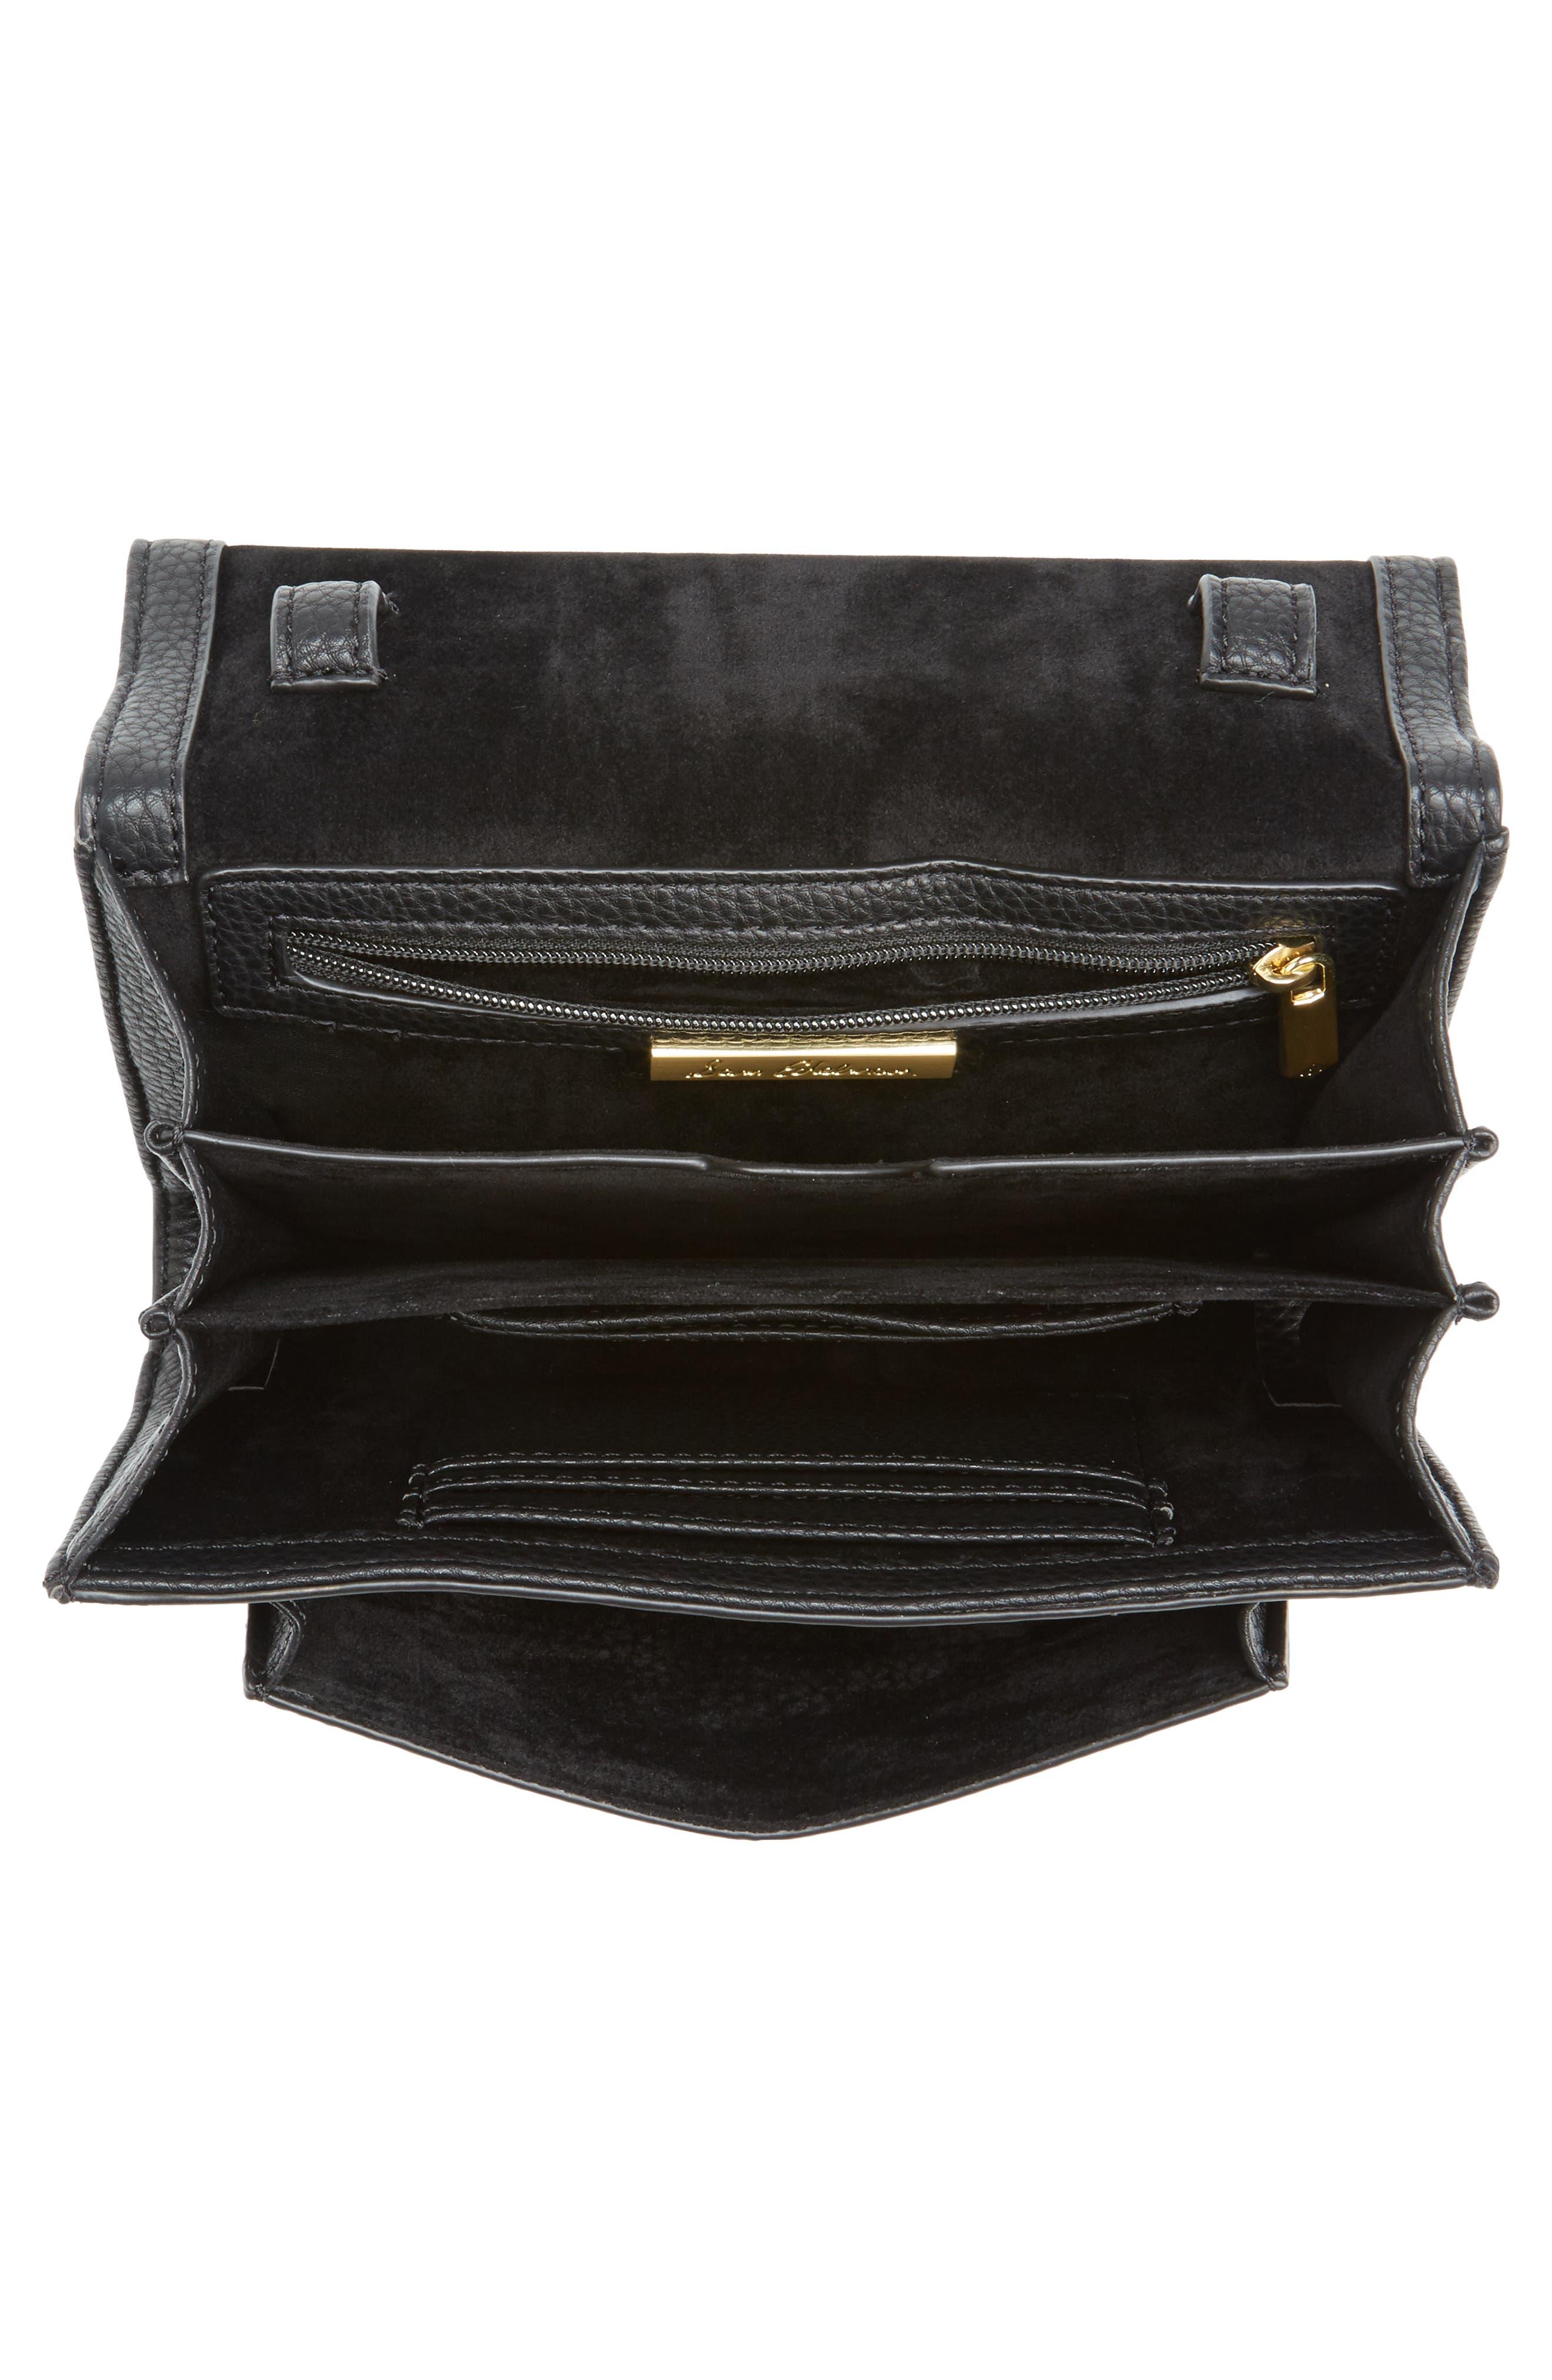 Florence Faux Leather Clutch Wallet,                             Alternate thumbnail 4, color,                             001